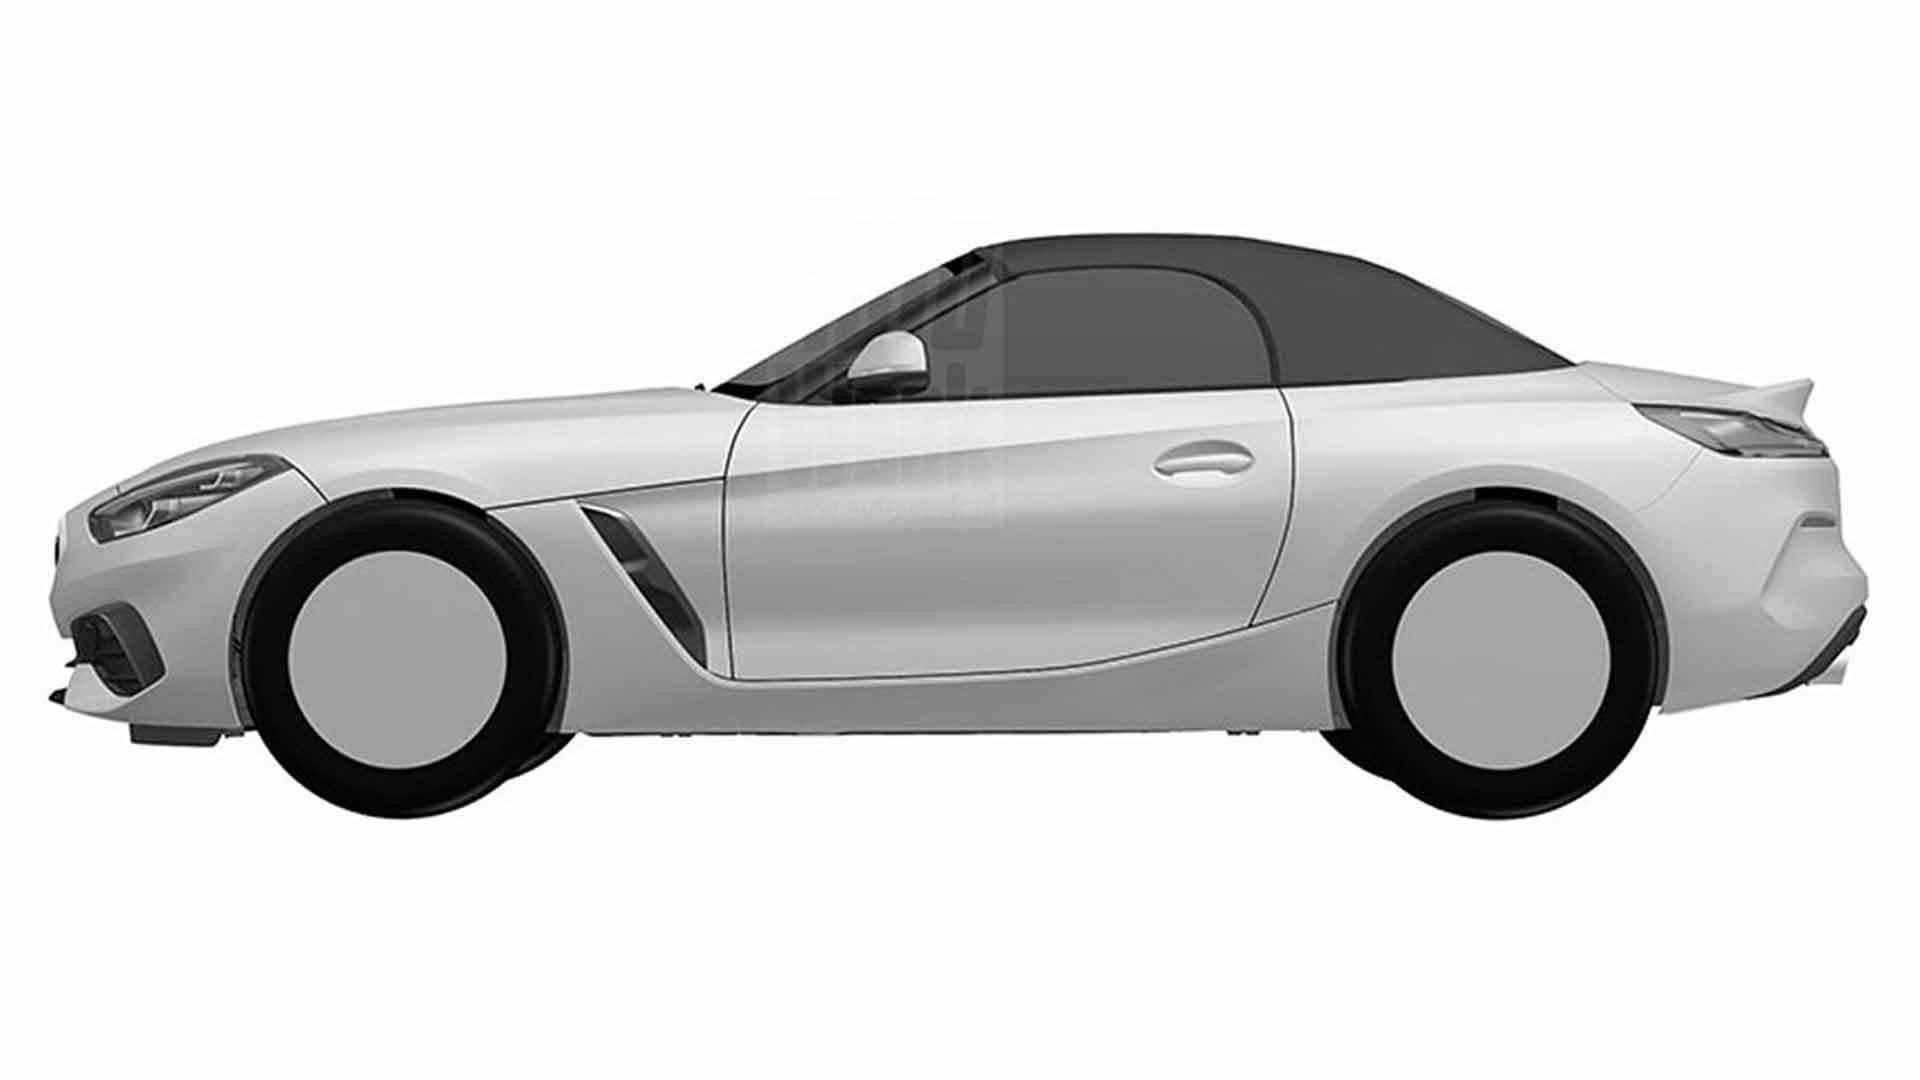 BMW Z4 Design Registration sketches (1)